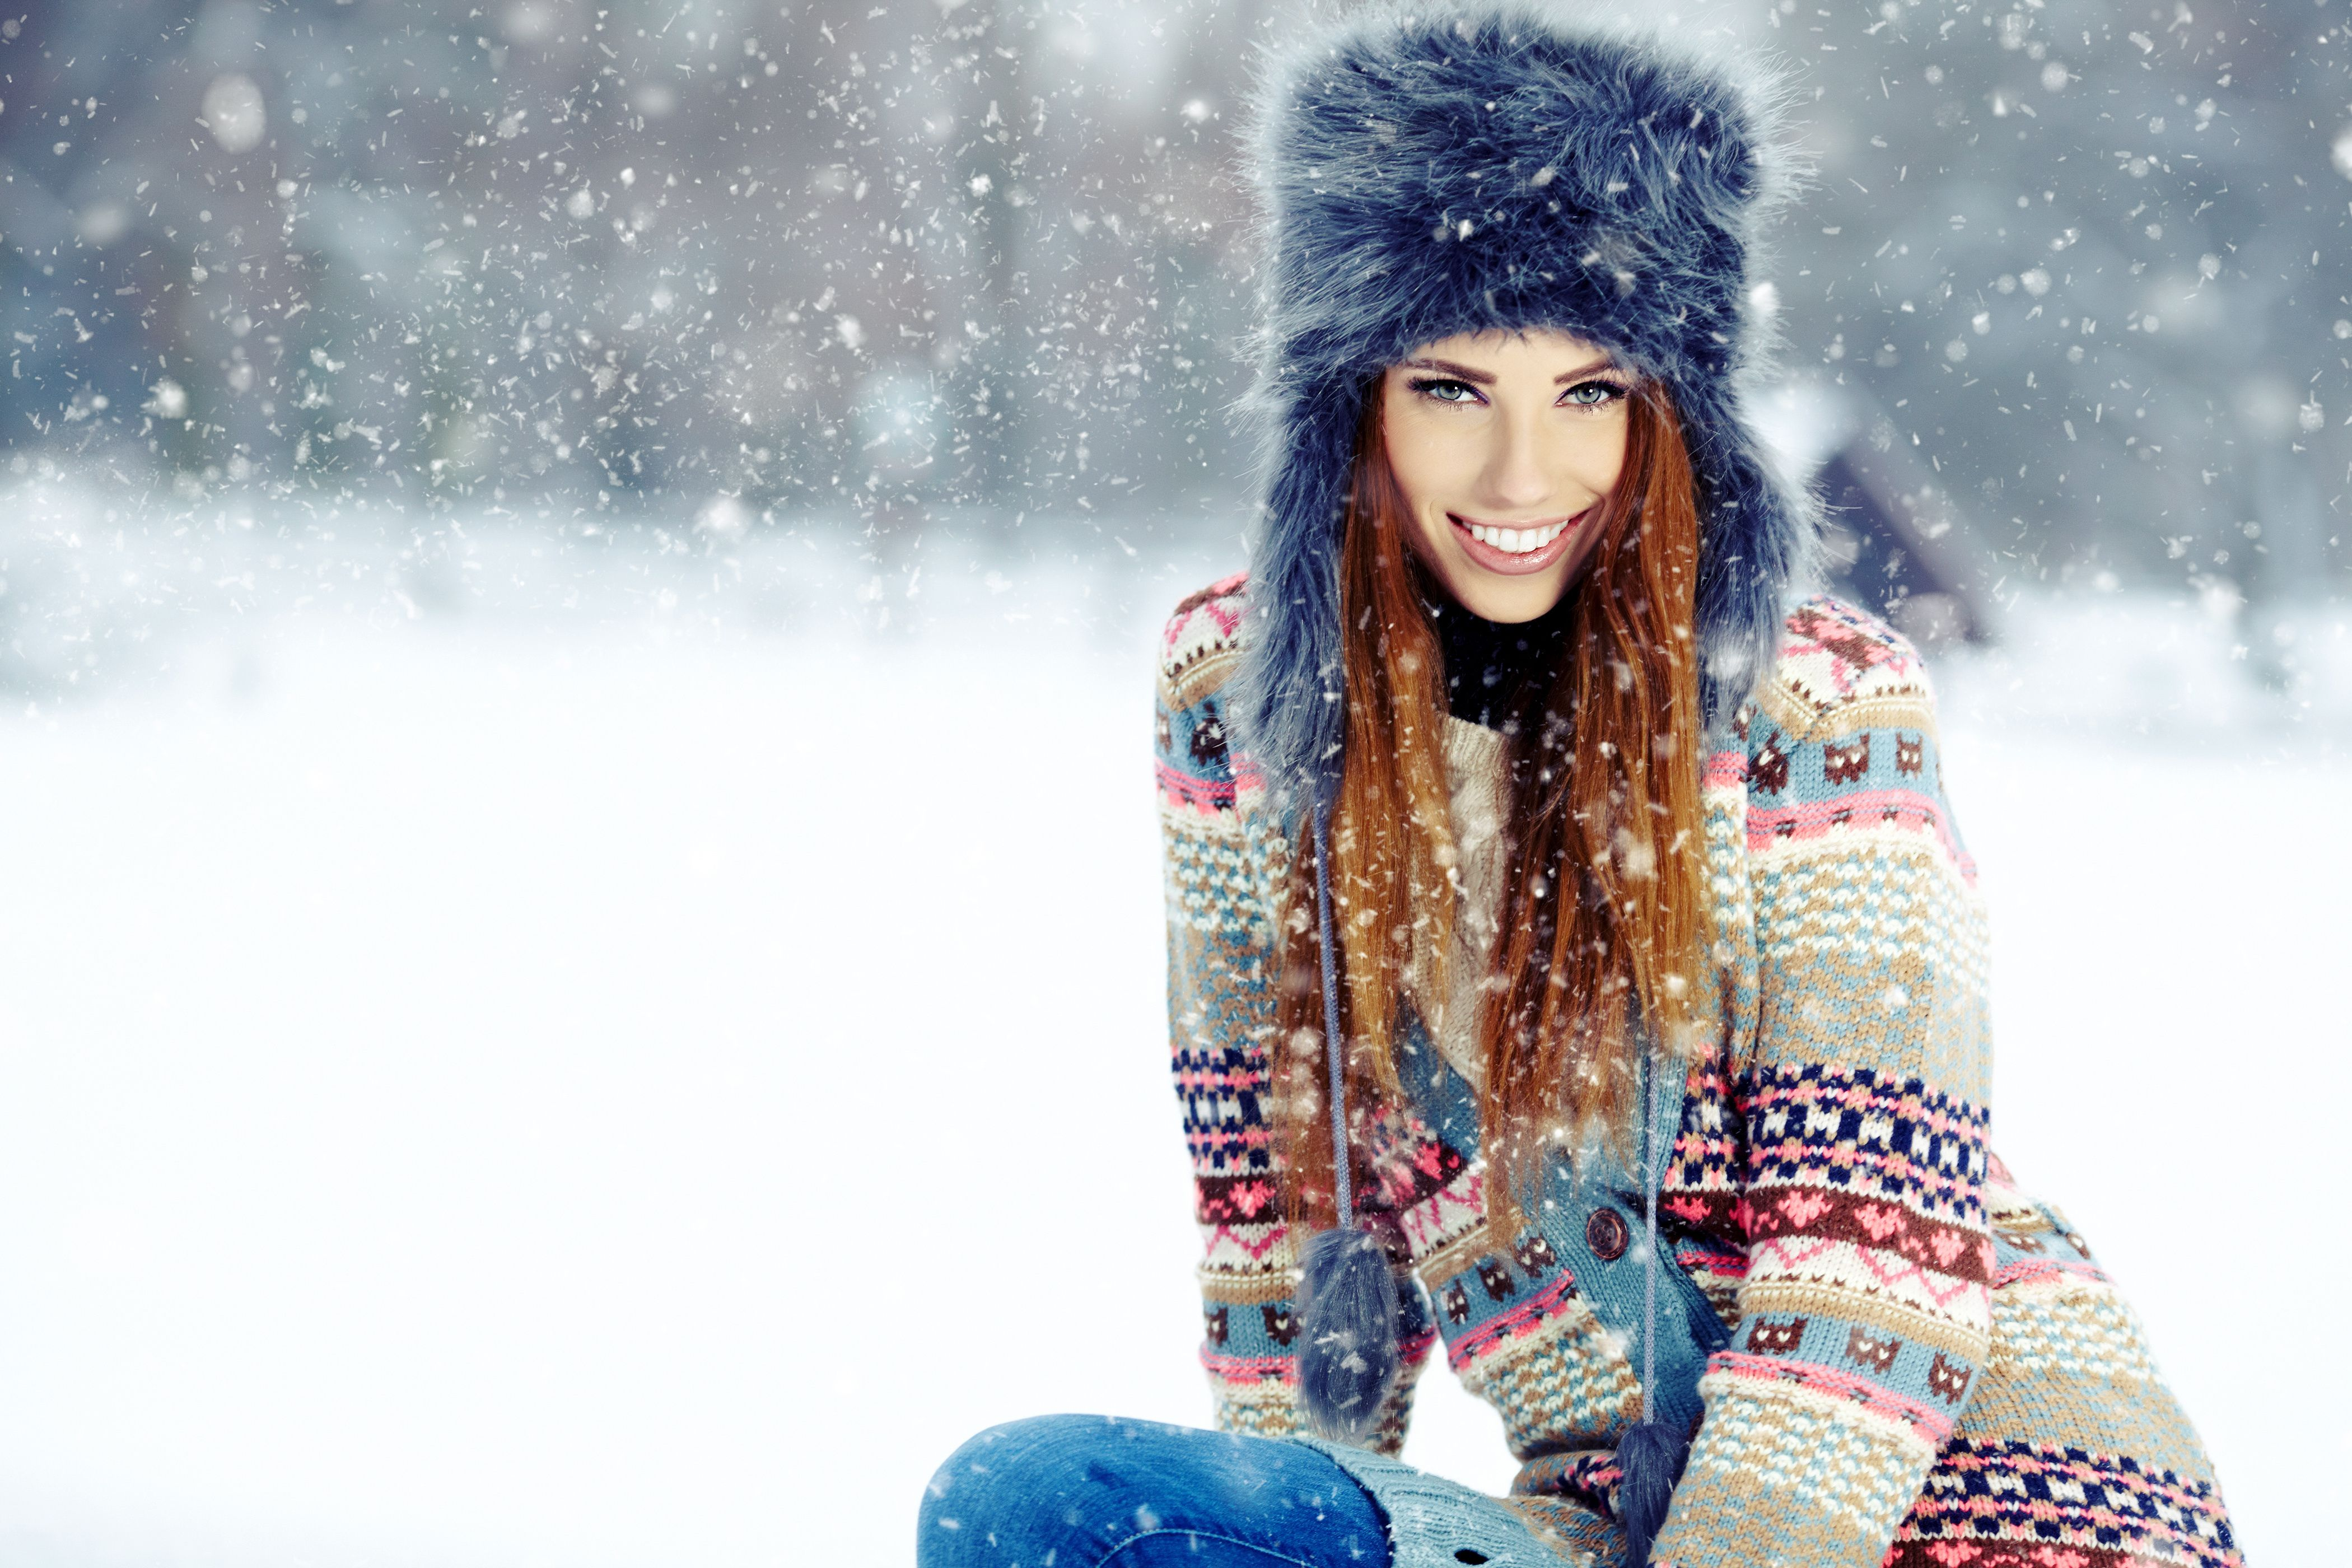 Sonrisa nieve del invierno Hermosas Fem Pinterest